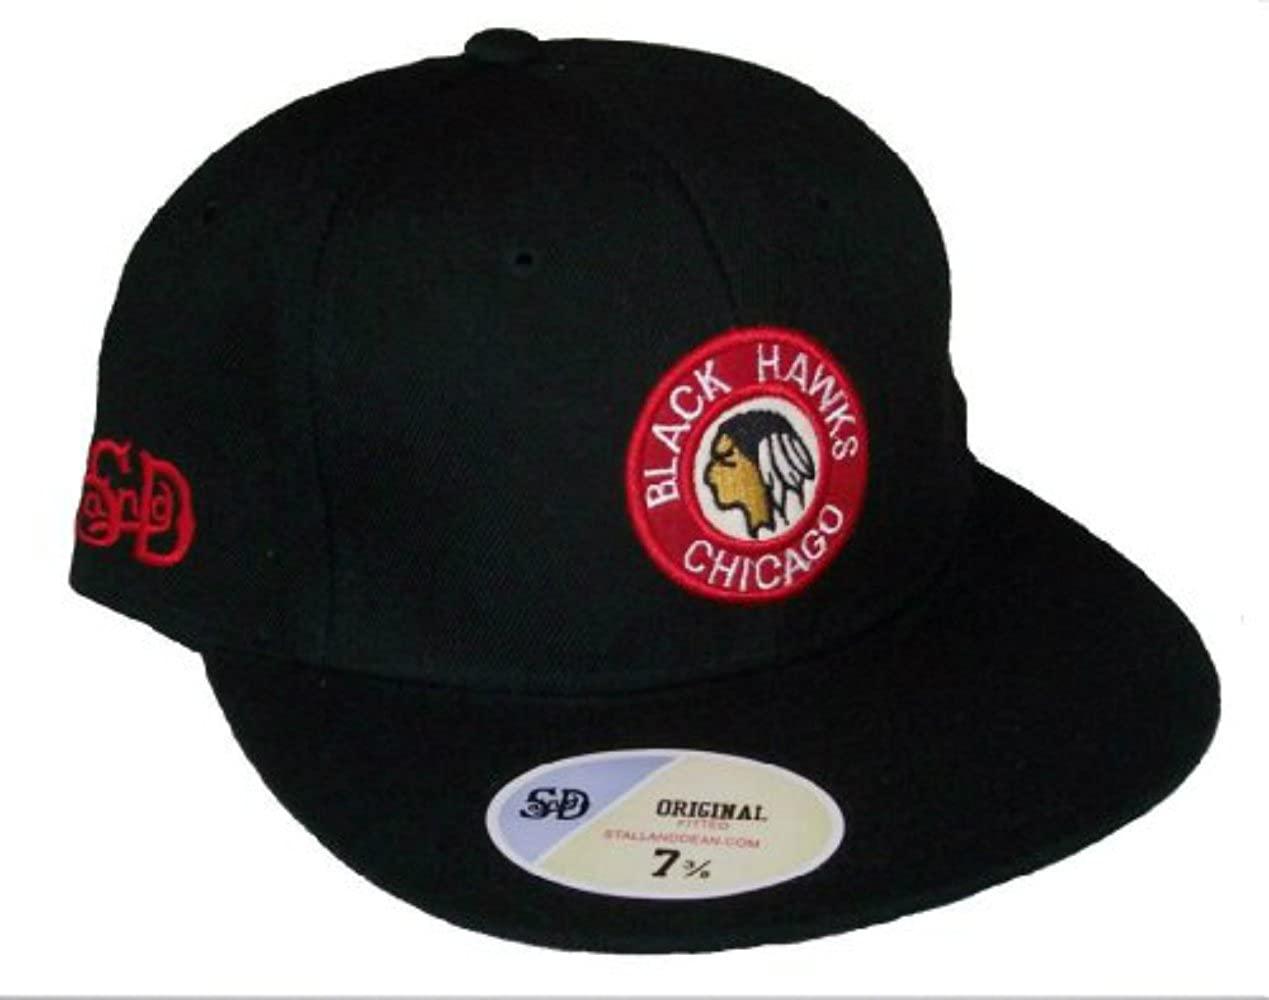 Genuine Merchandise Chicago Blackhawks Vintage Logo Black Fitted 8 Hat Cap